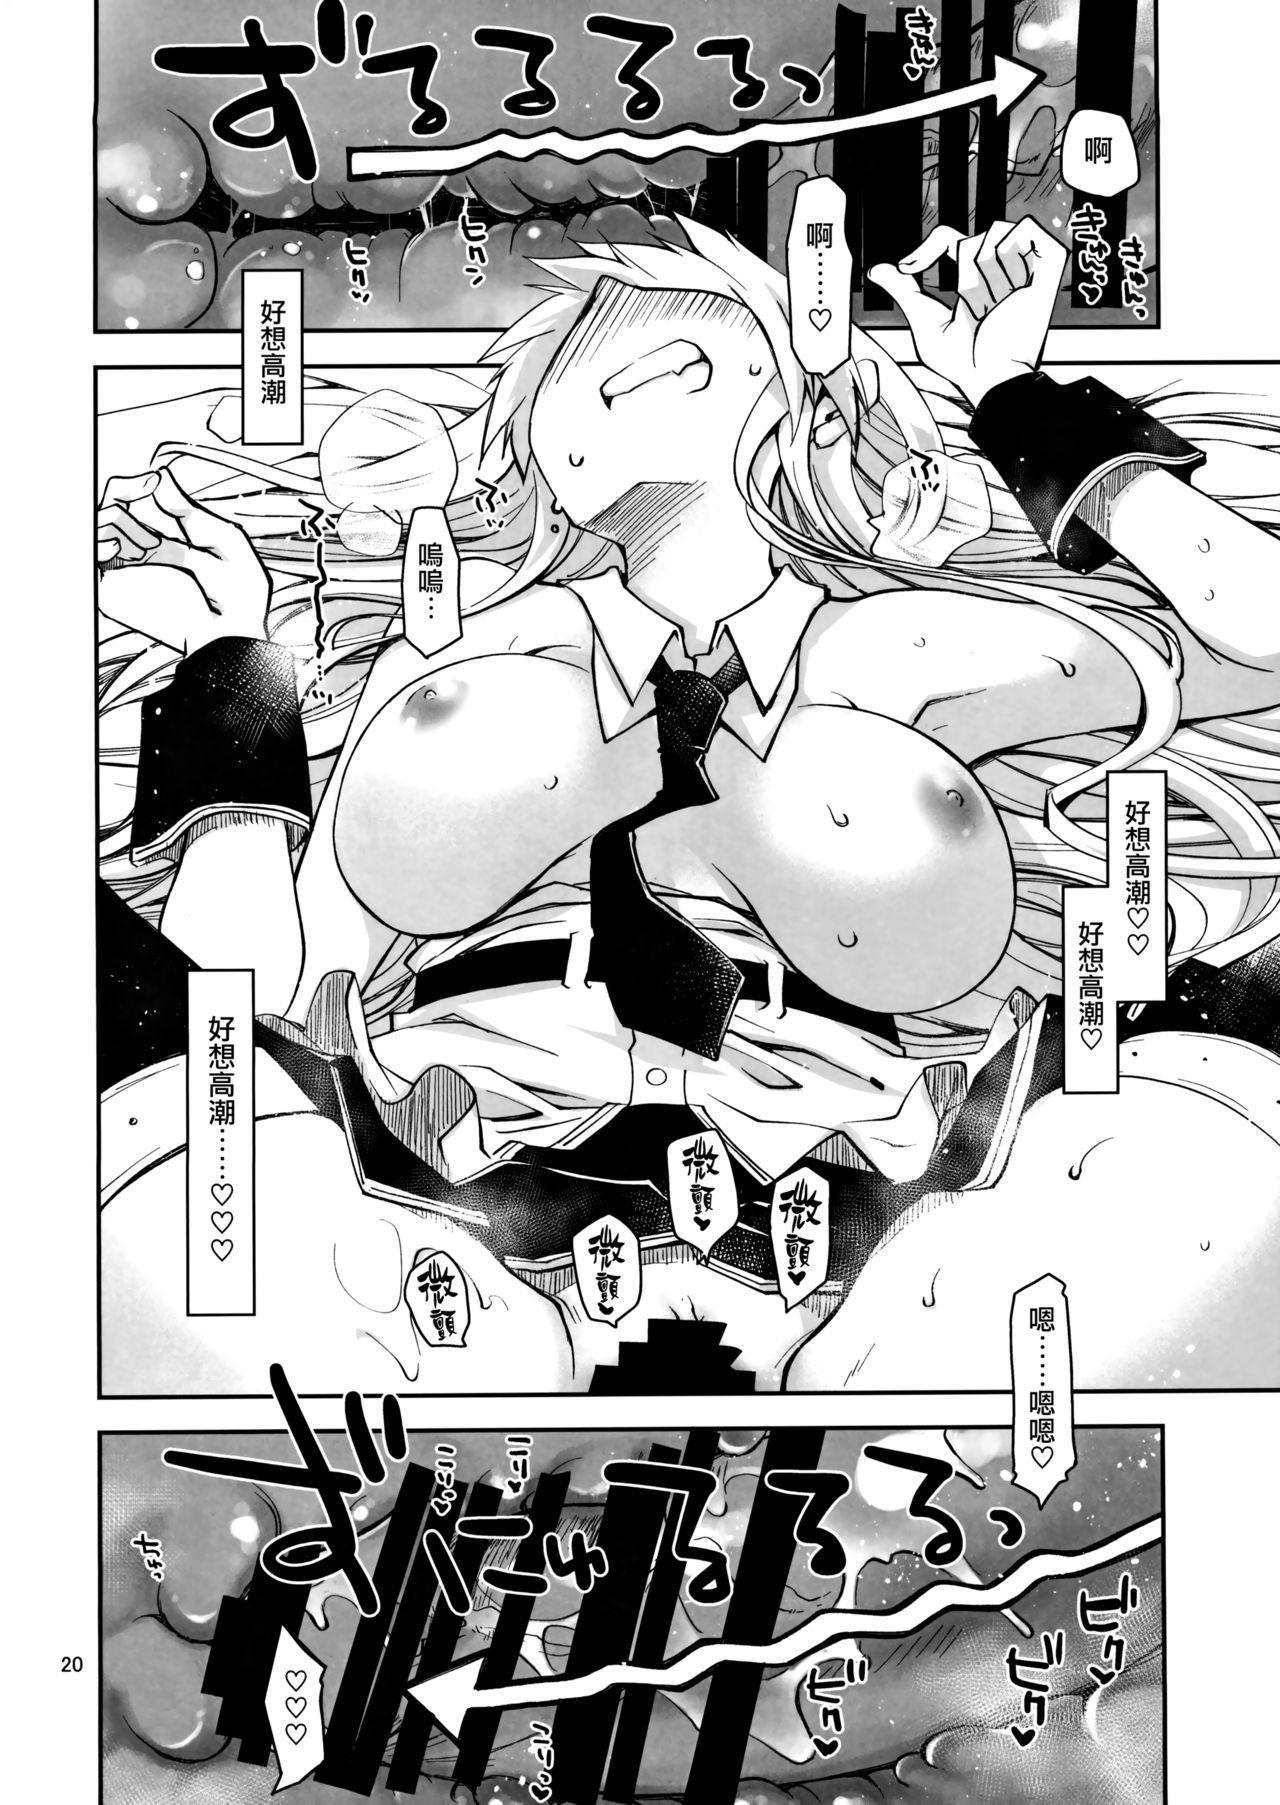 Maid in Enterprise 19